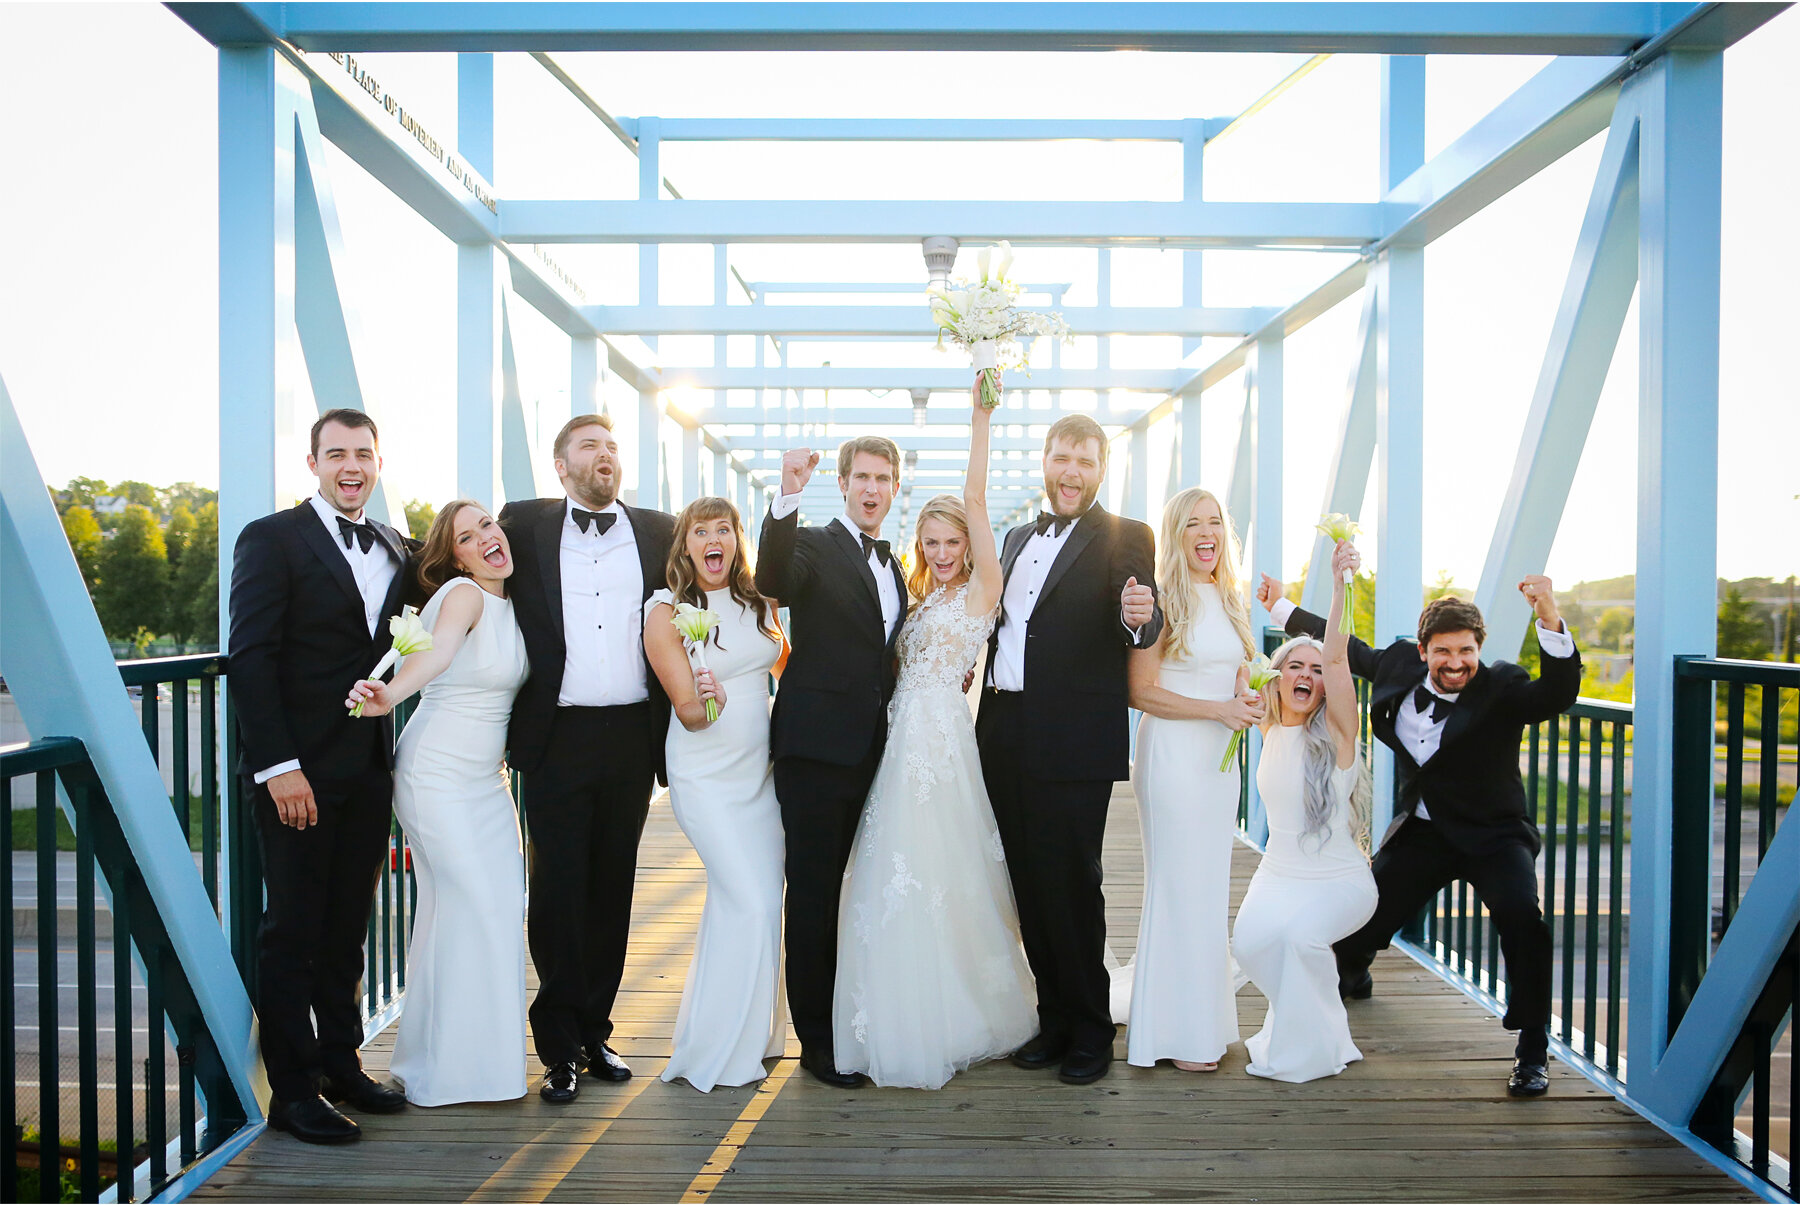 16 Wedding Vick Photography Minneapolis Minnesota Bridesmaids Groomsmen Blue Bridge Michelle and William.jpg